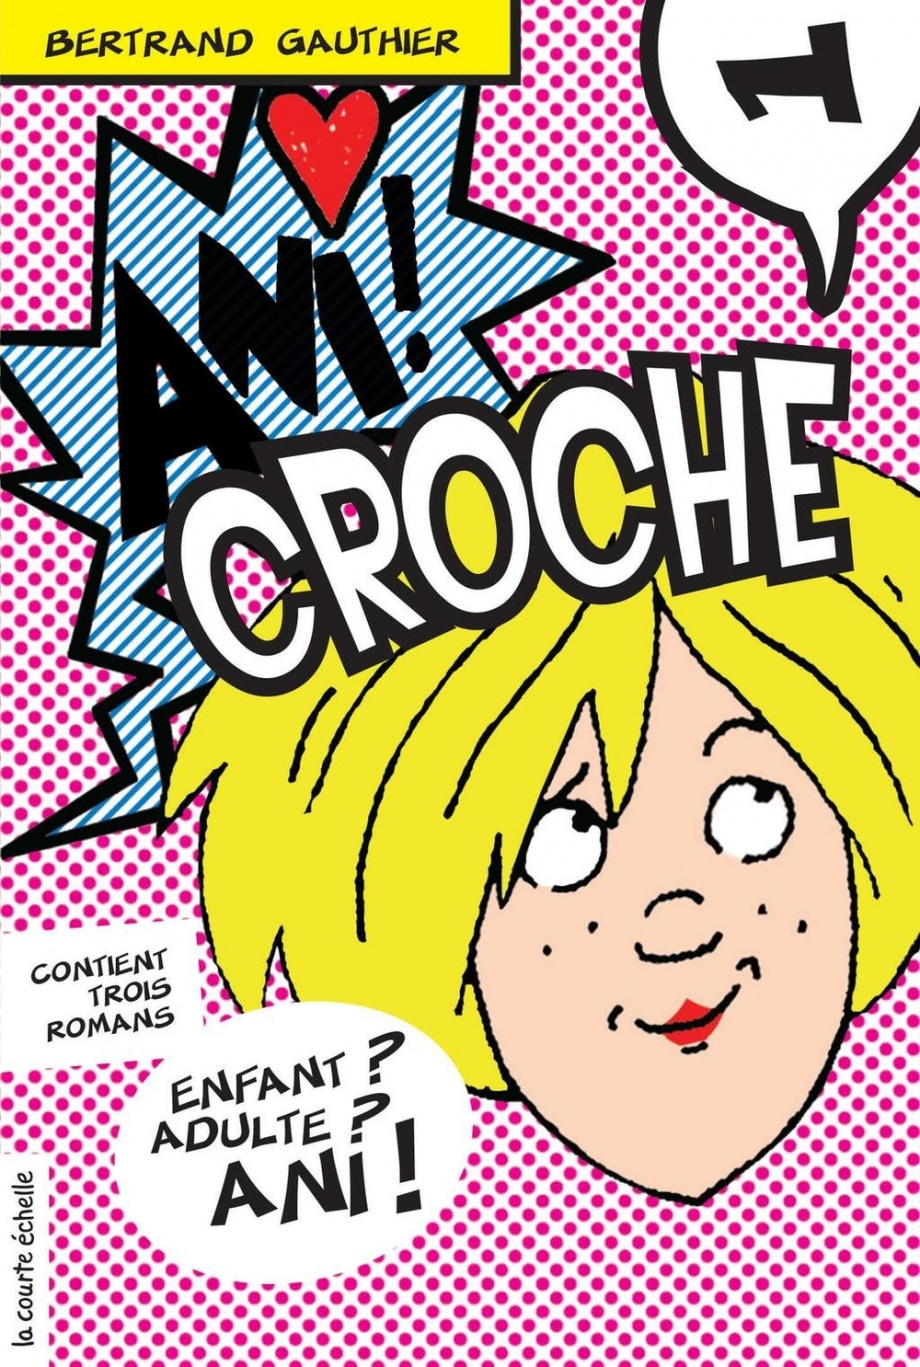 Image: Ani Croche